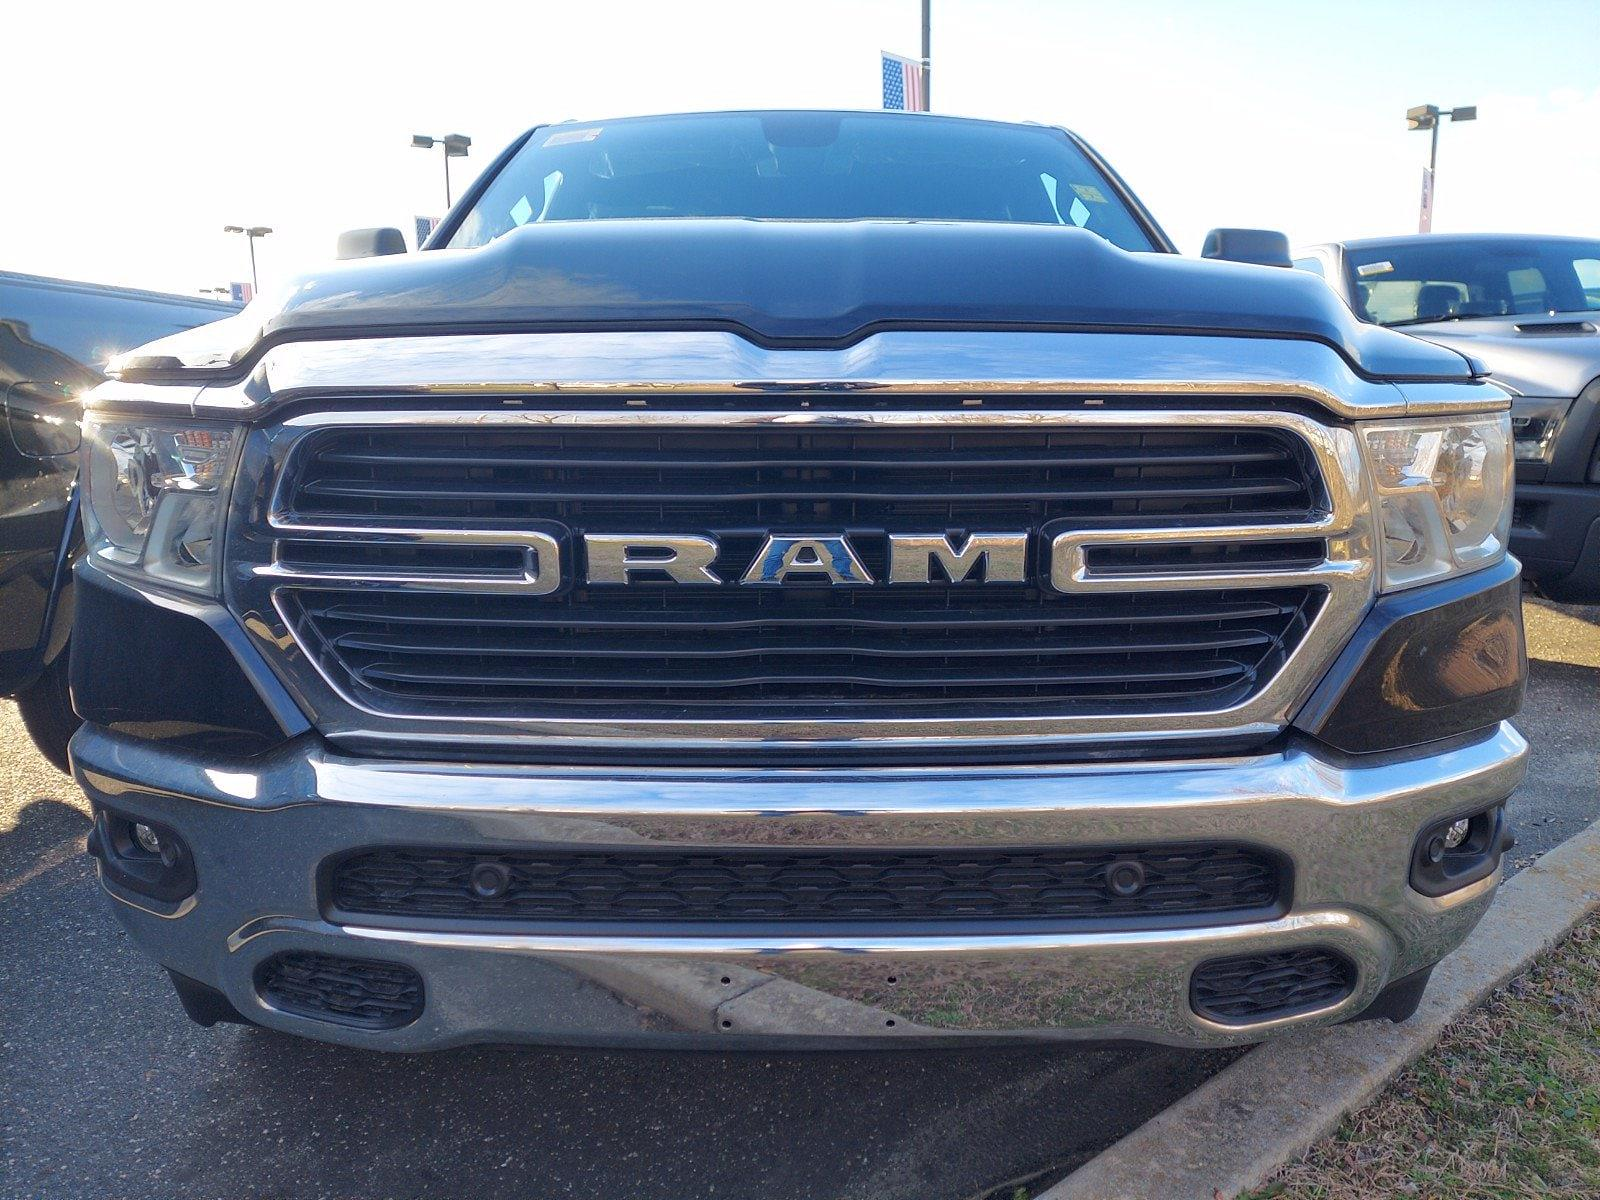 2021 Ram 1500 Quad Cab 4x2, Pickup #CM119 - photo 4